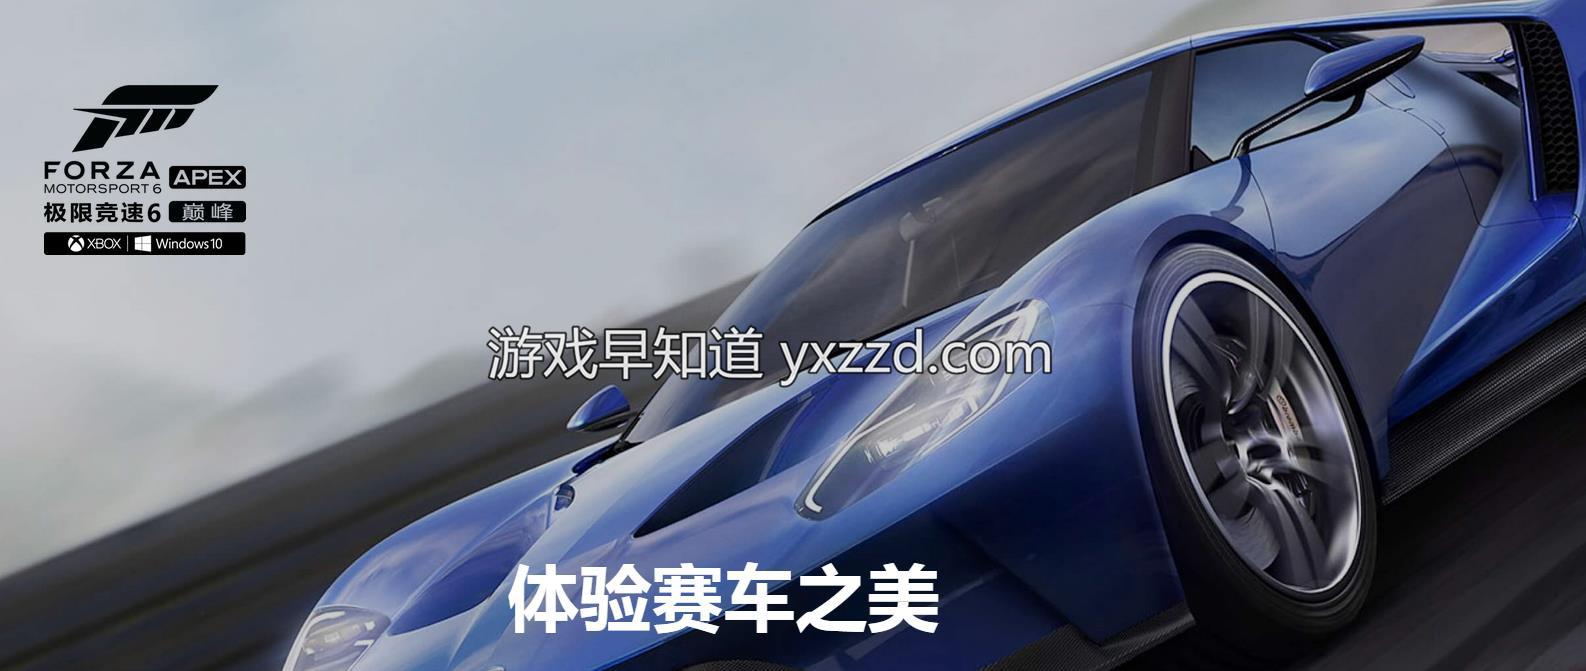 极限竞速6:巅峰Forza Motorsport 6: Apex